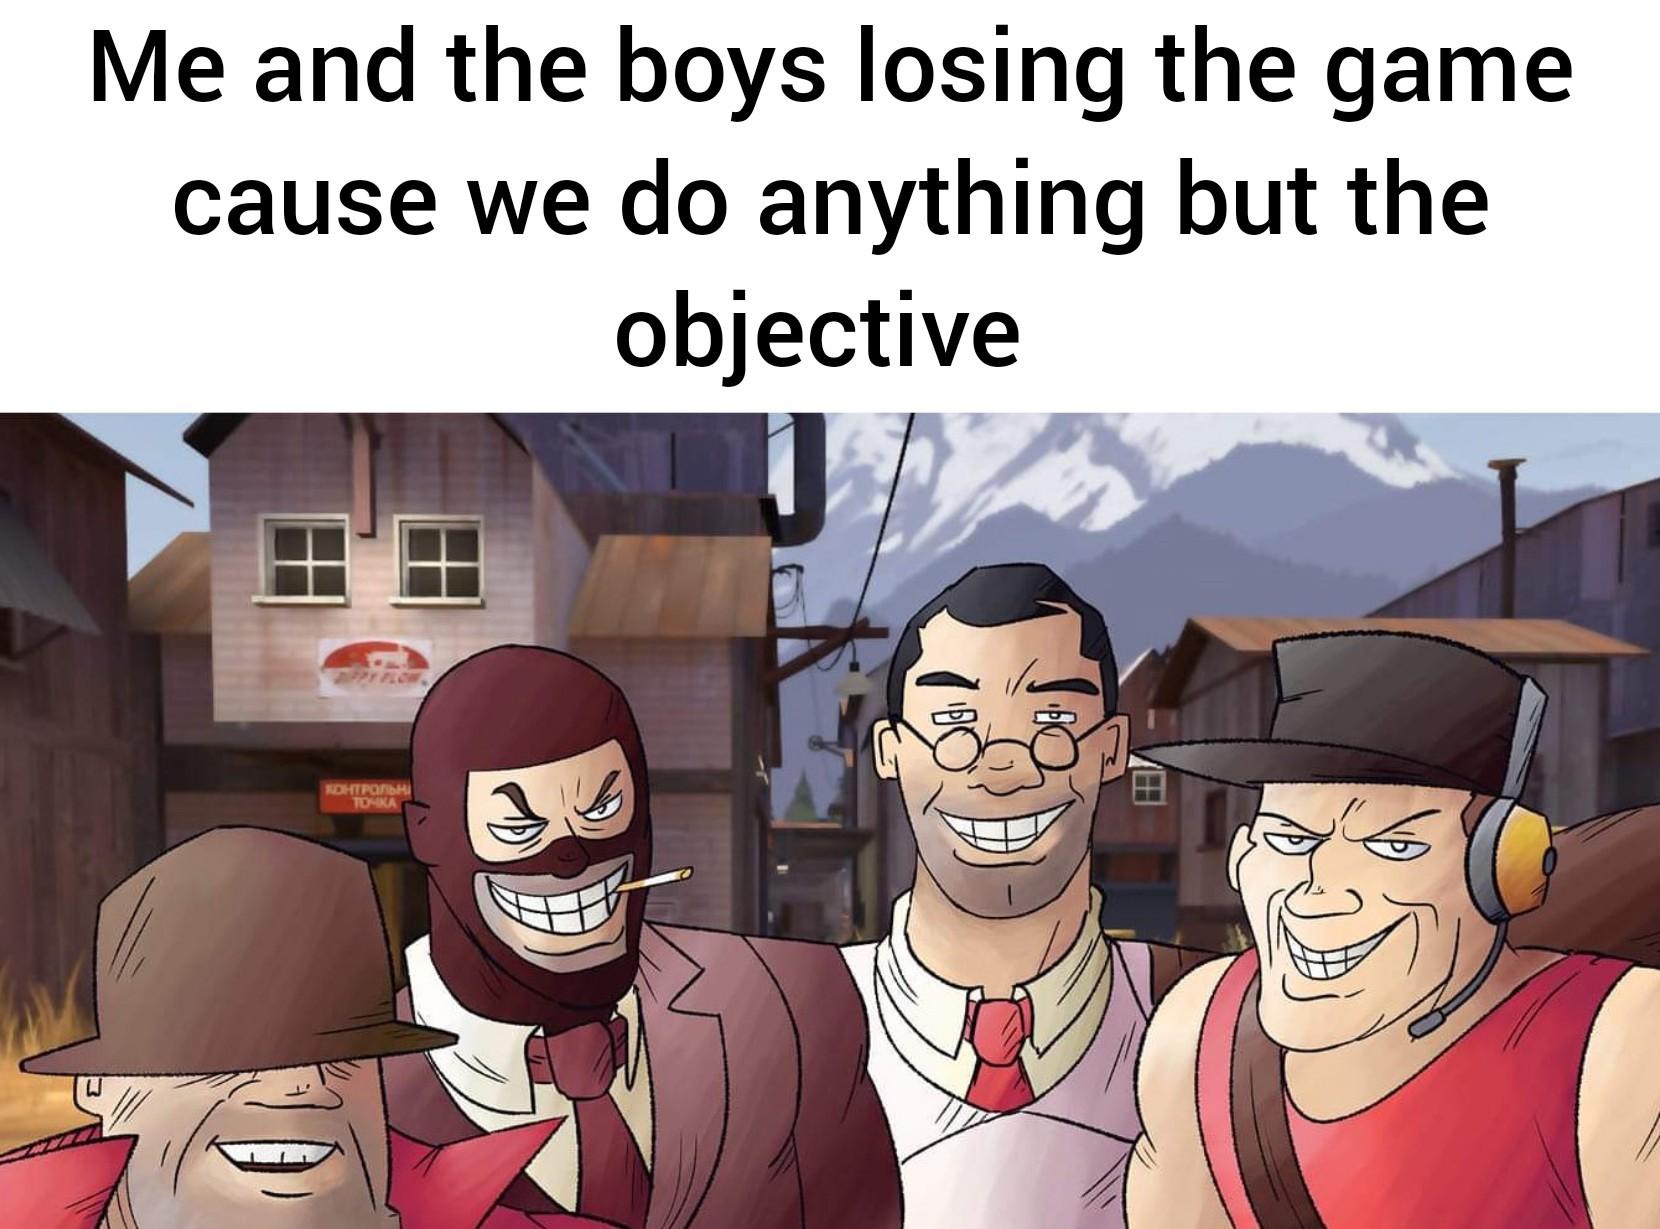 Still fun tho - meme